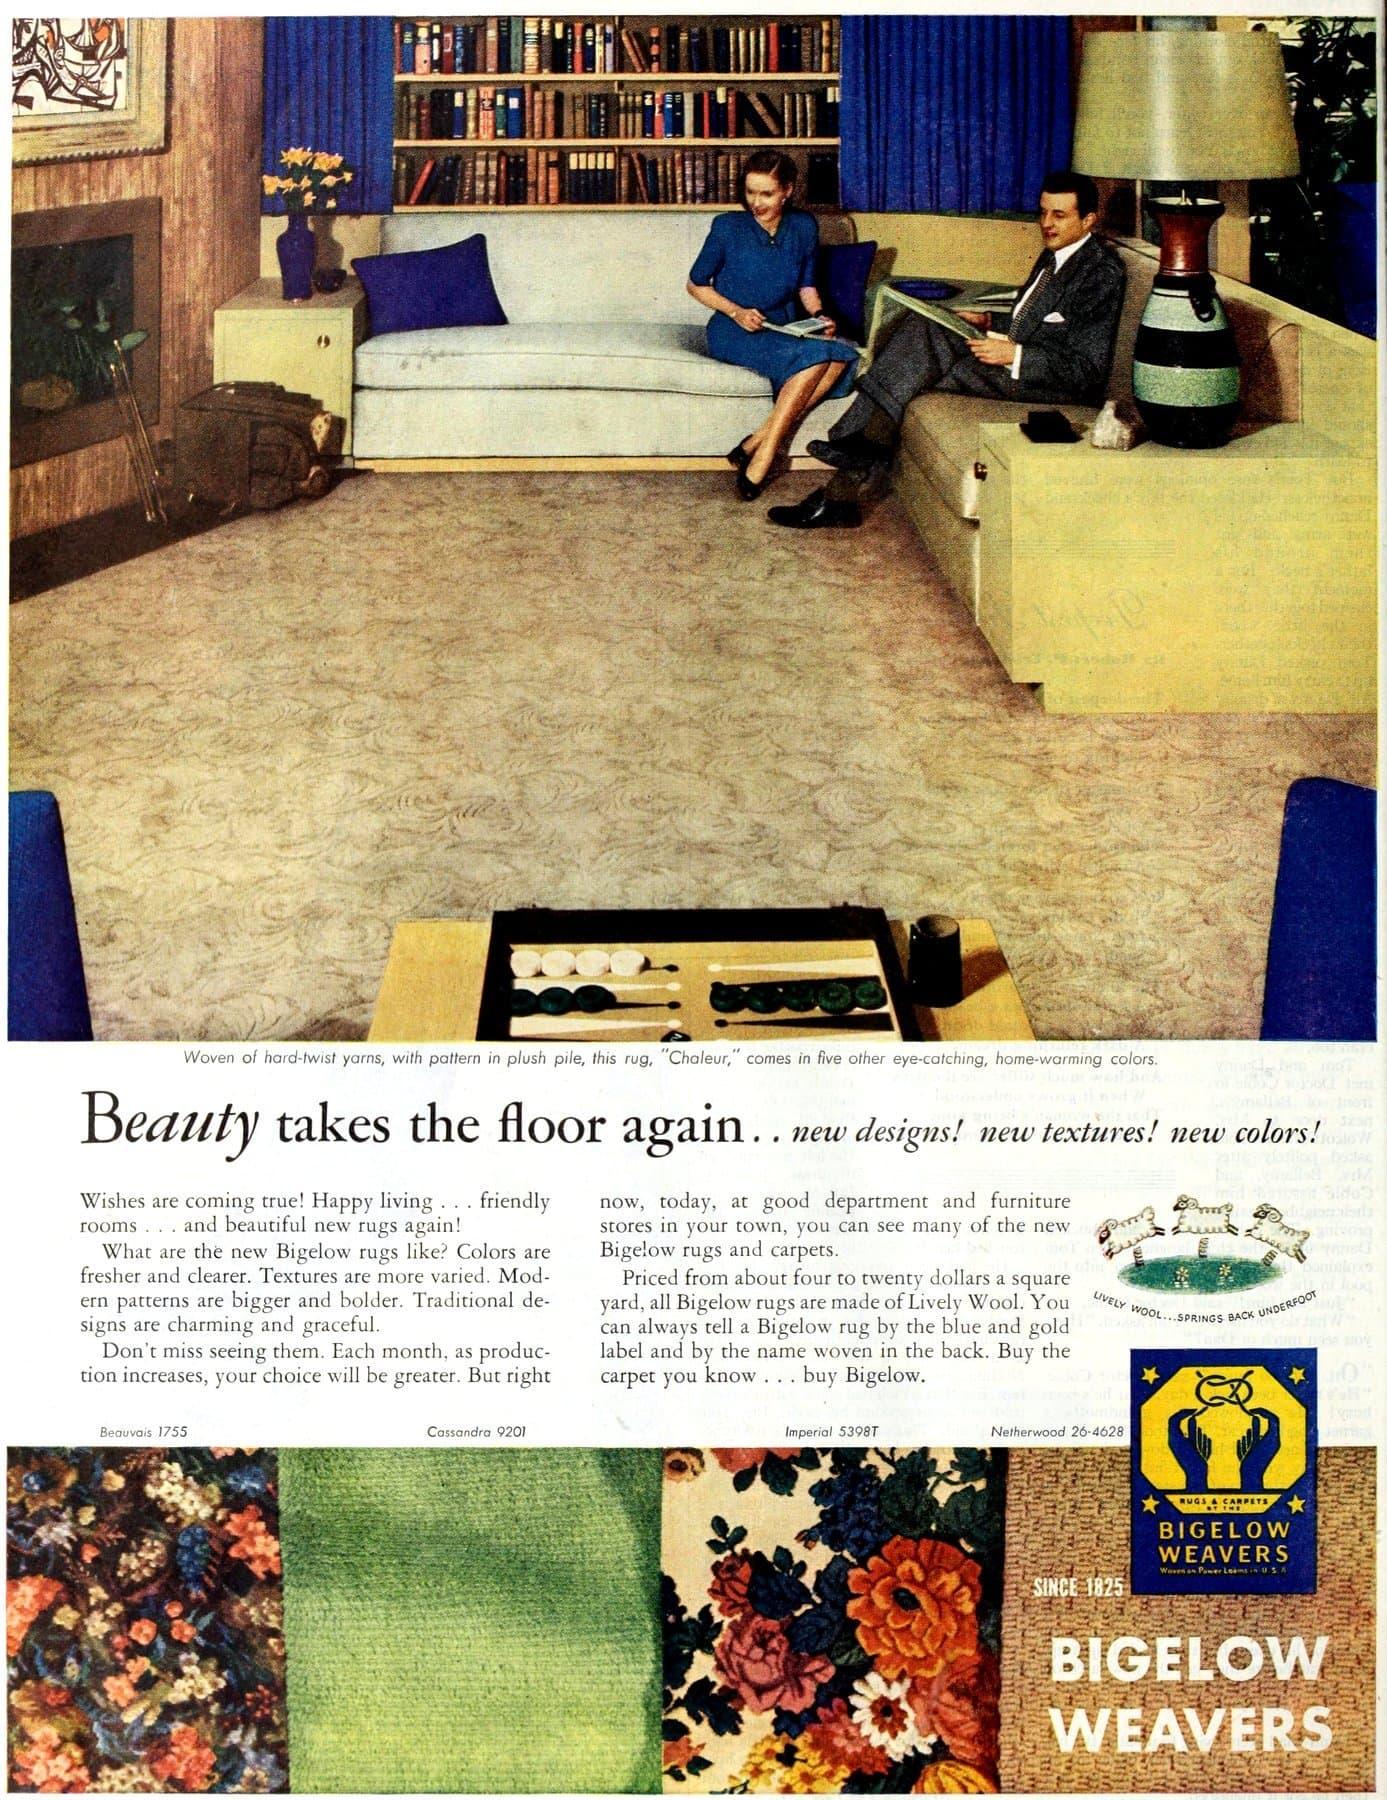 Textured retro Bigelow carpets (1946)